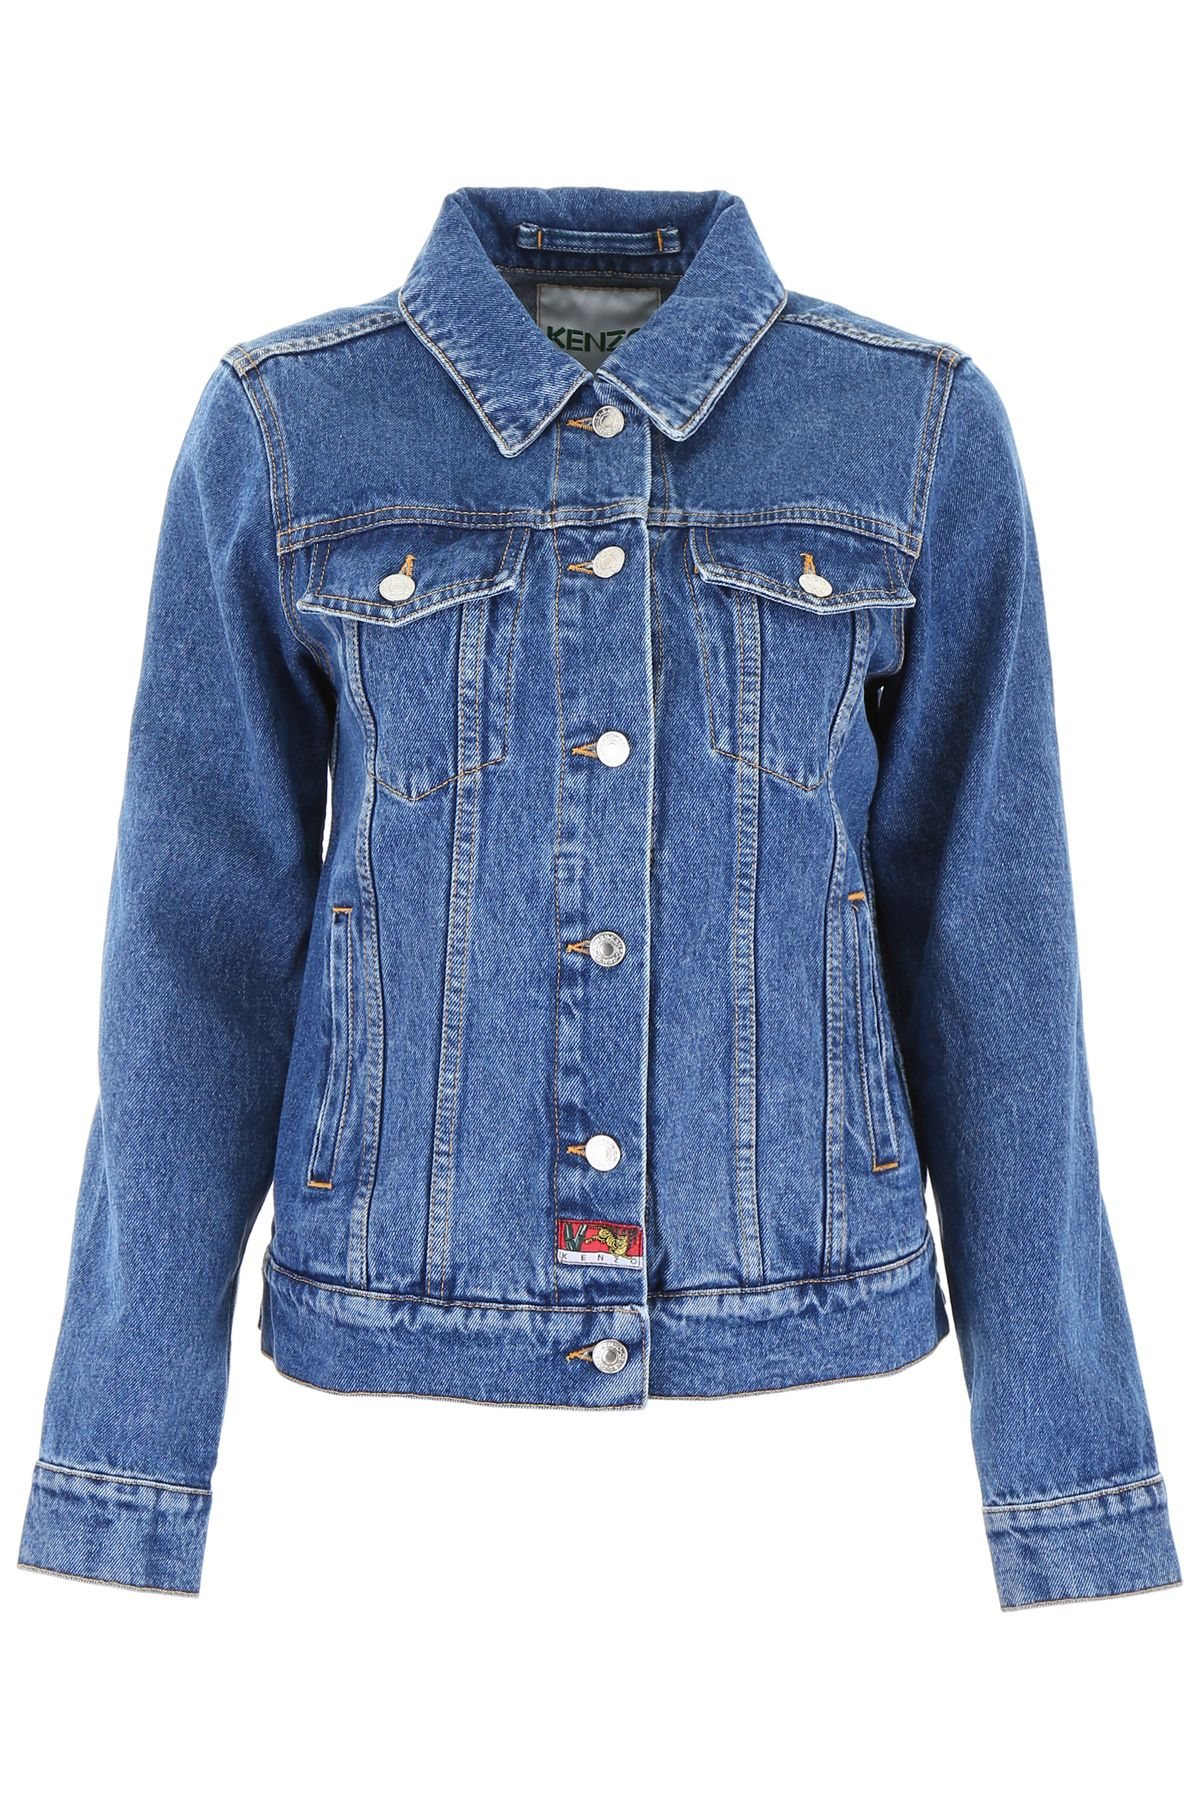 aa3dc2d21 Kenzo Kenzo Bamboo Tiger Denim Jacket - INK (Blue) - 10923484 | italist